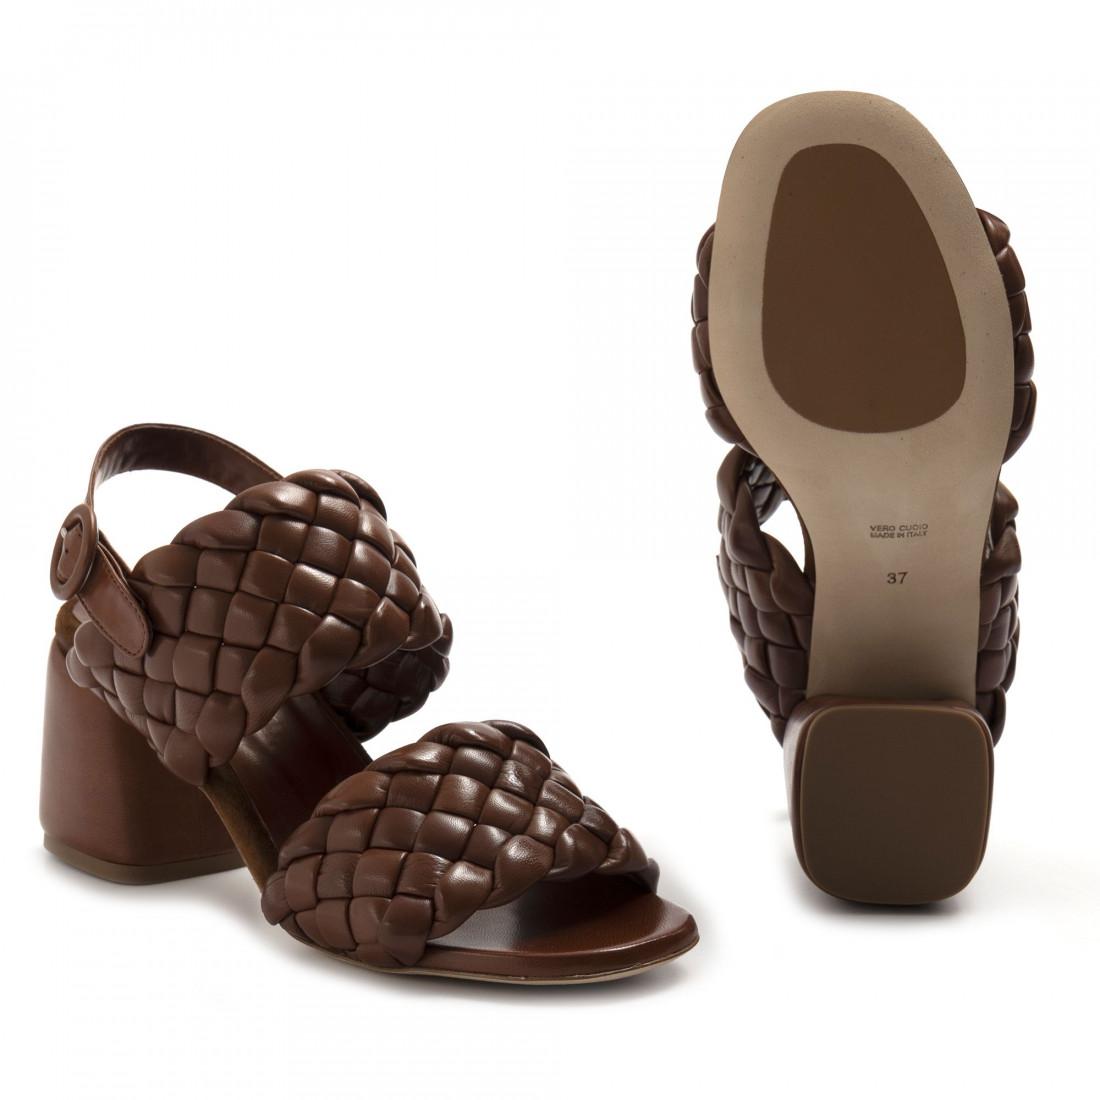 sandalen damen lorenzo masiero 21132intreccio cognac 8246